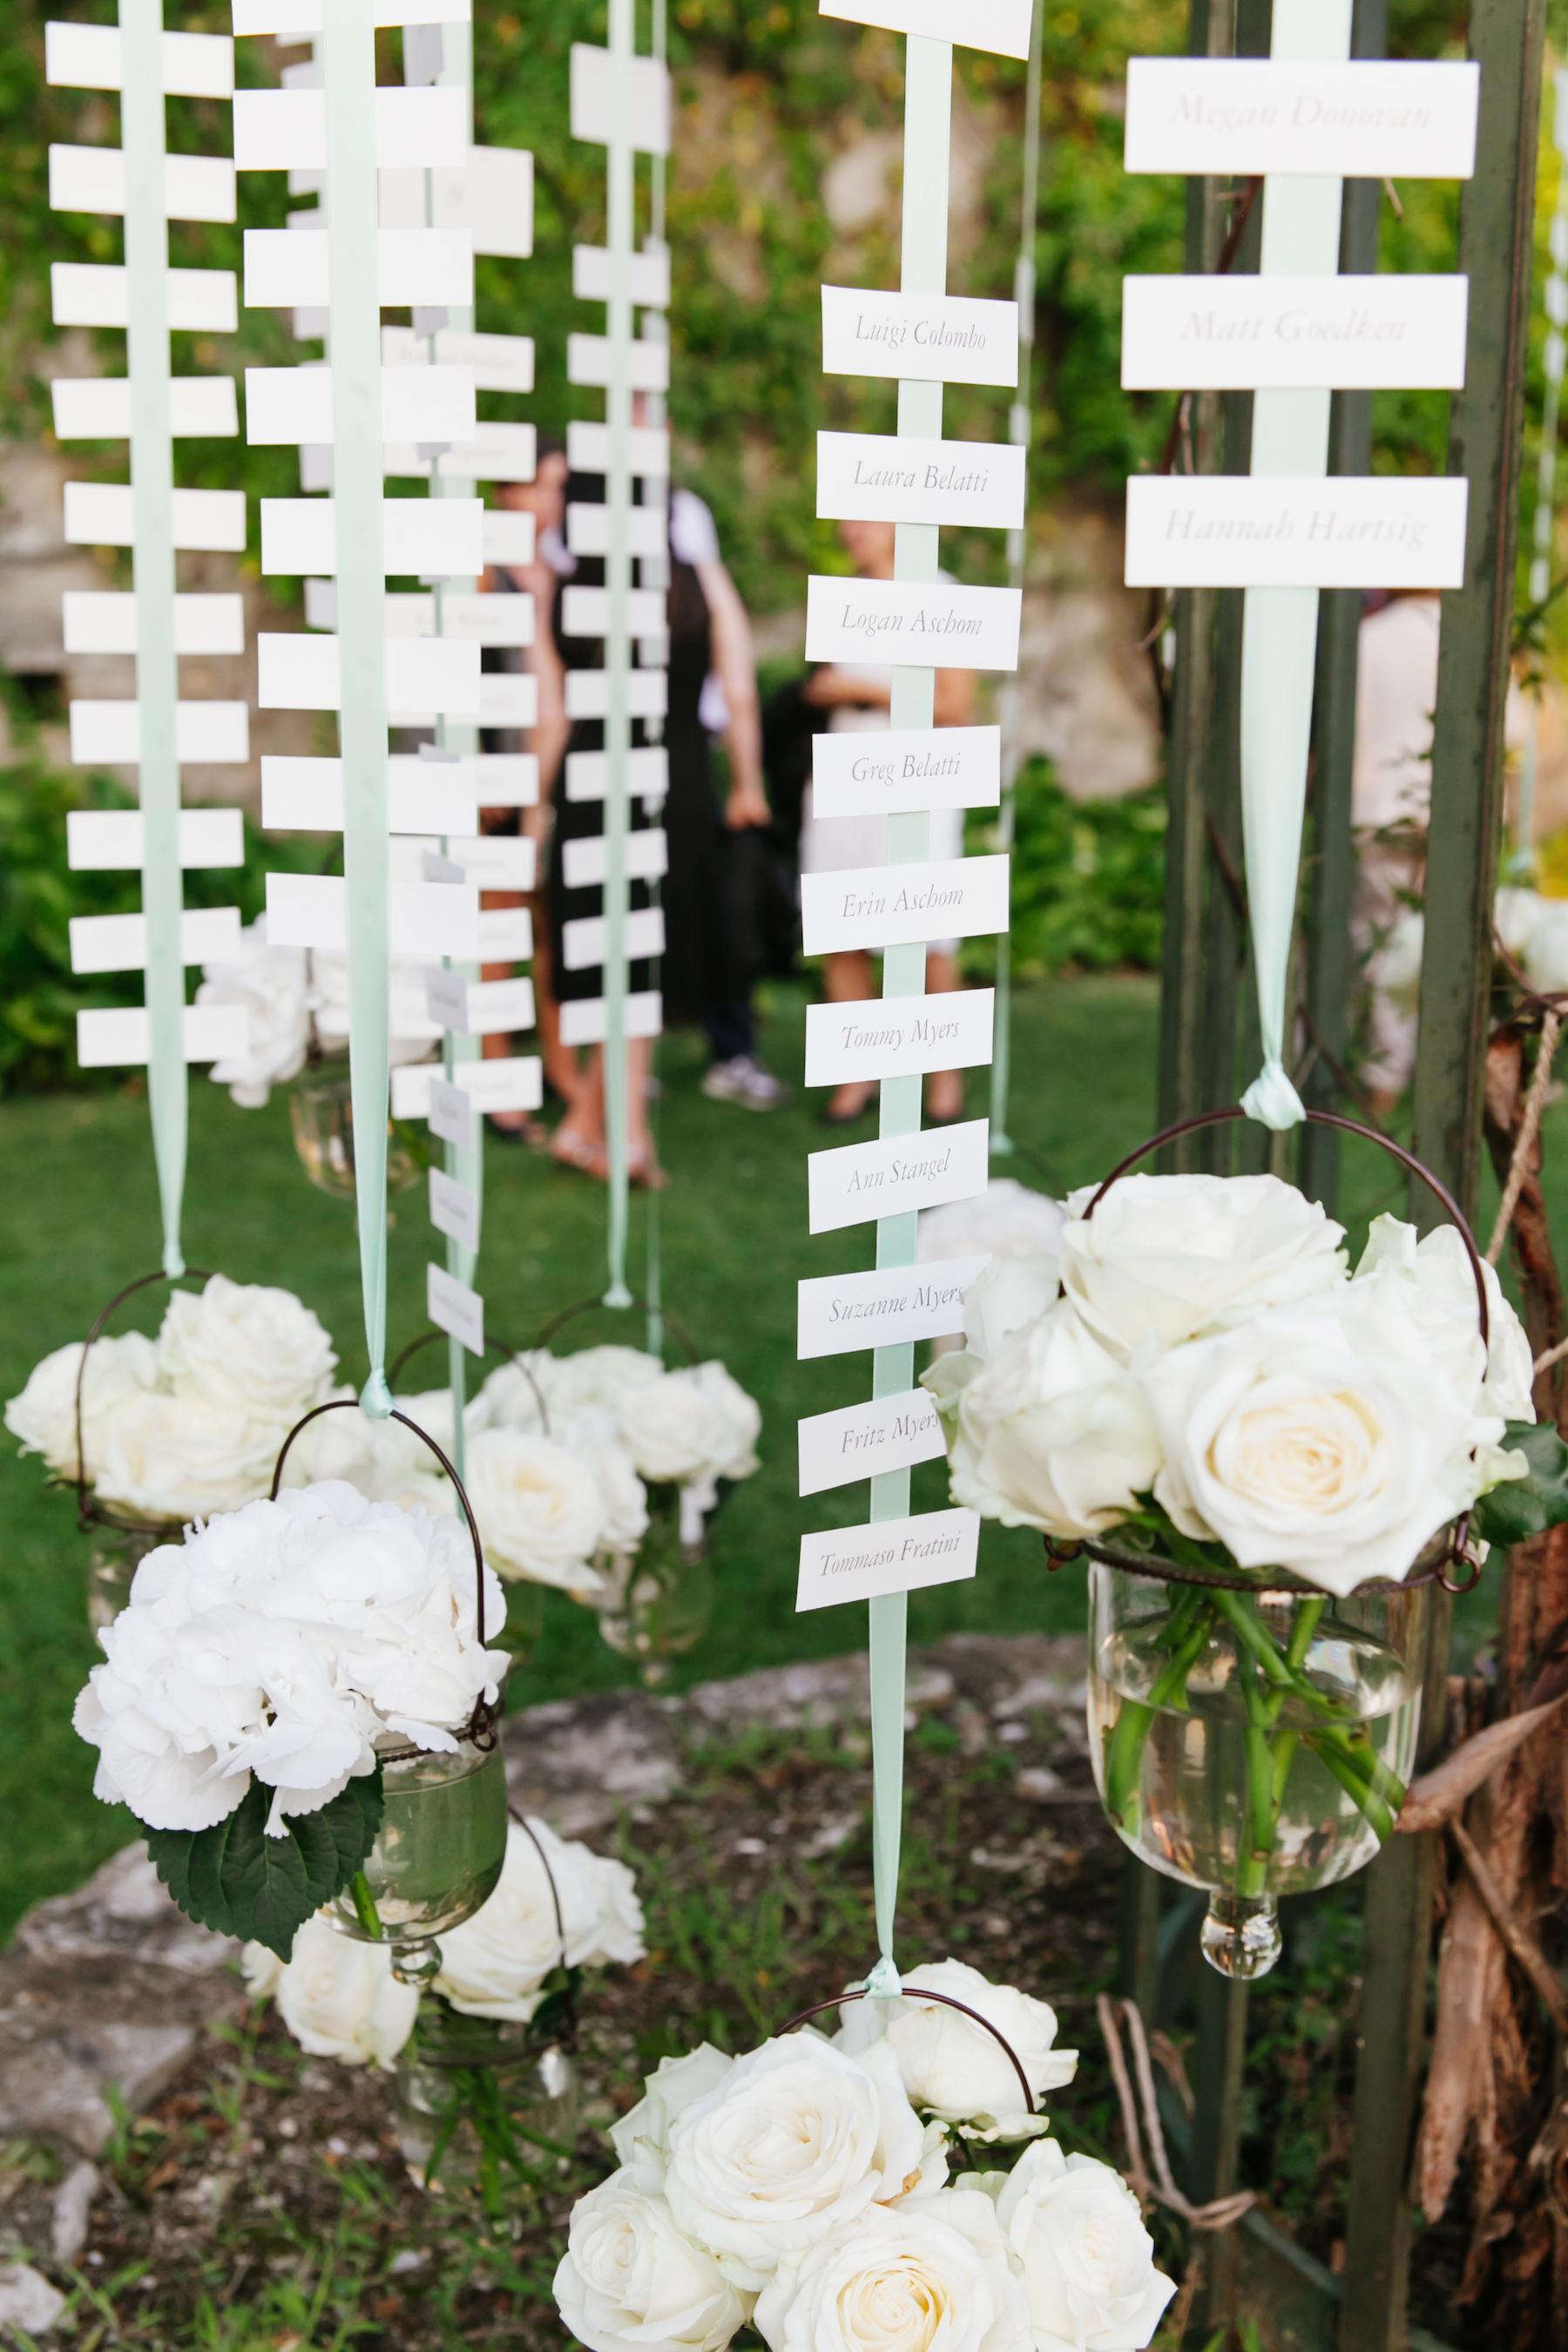 hanging flowers seating display